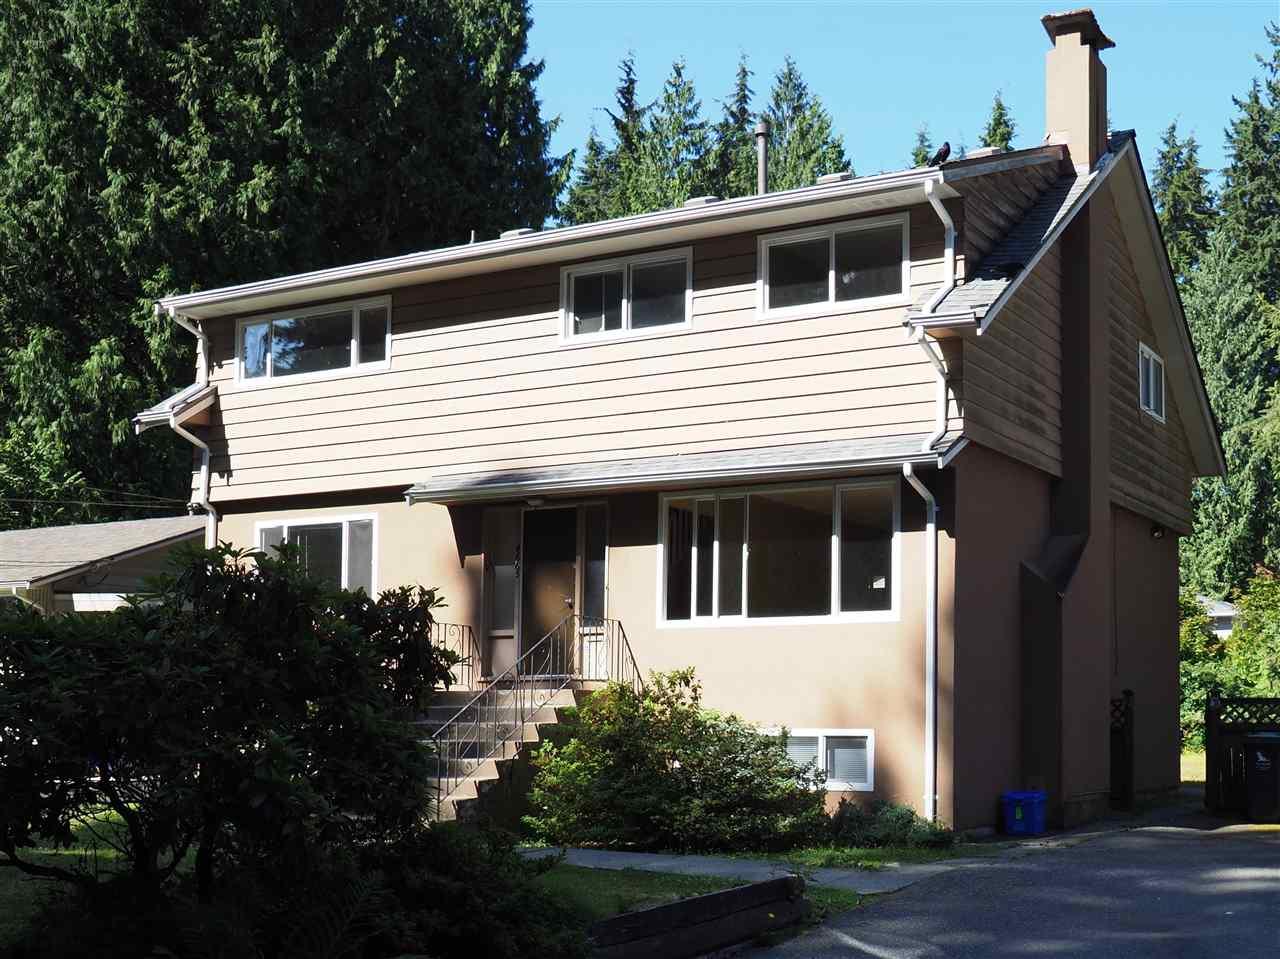 4665 UNDERWOOD AVENUE, North Vancouver, BC, V7K 2S3 Primary Photo